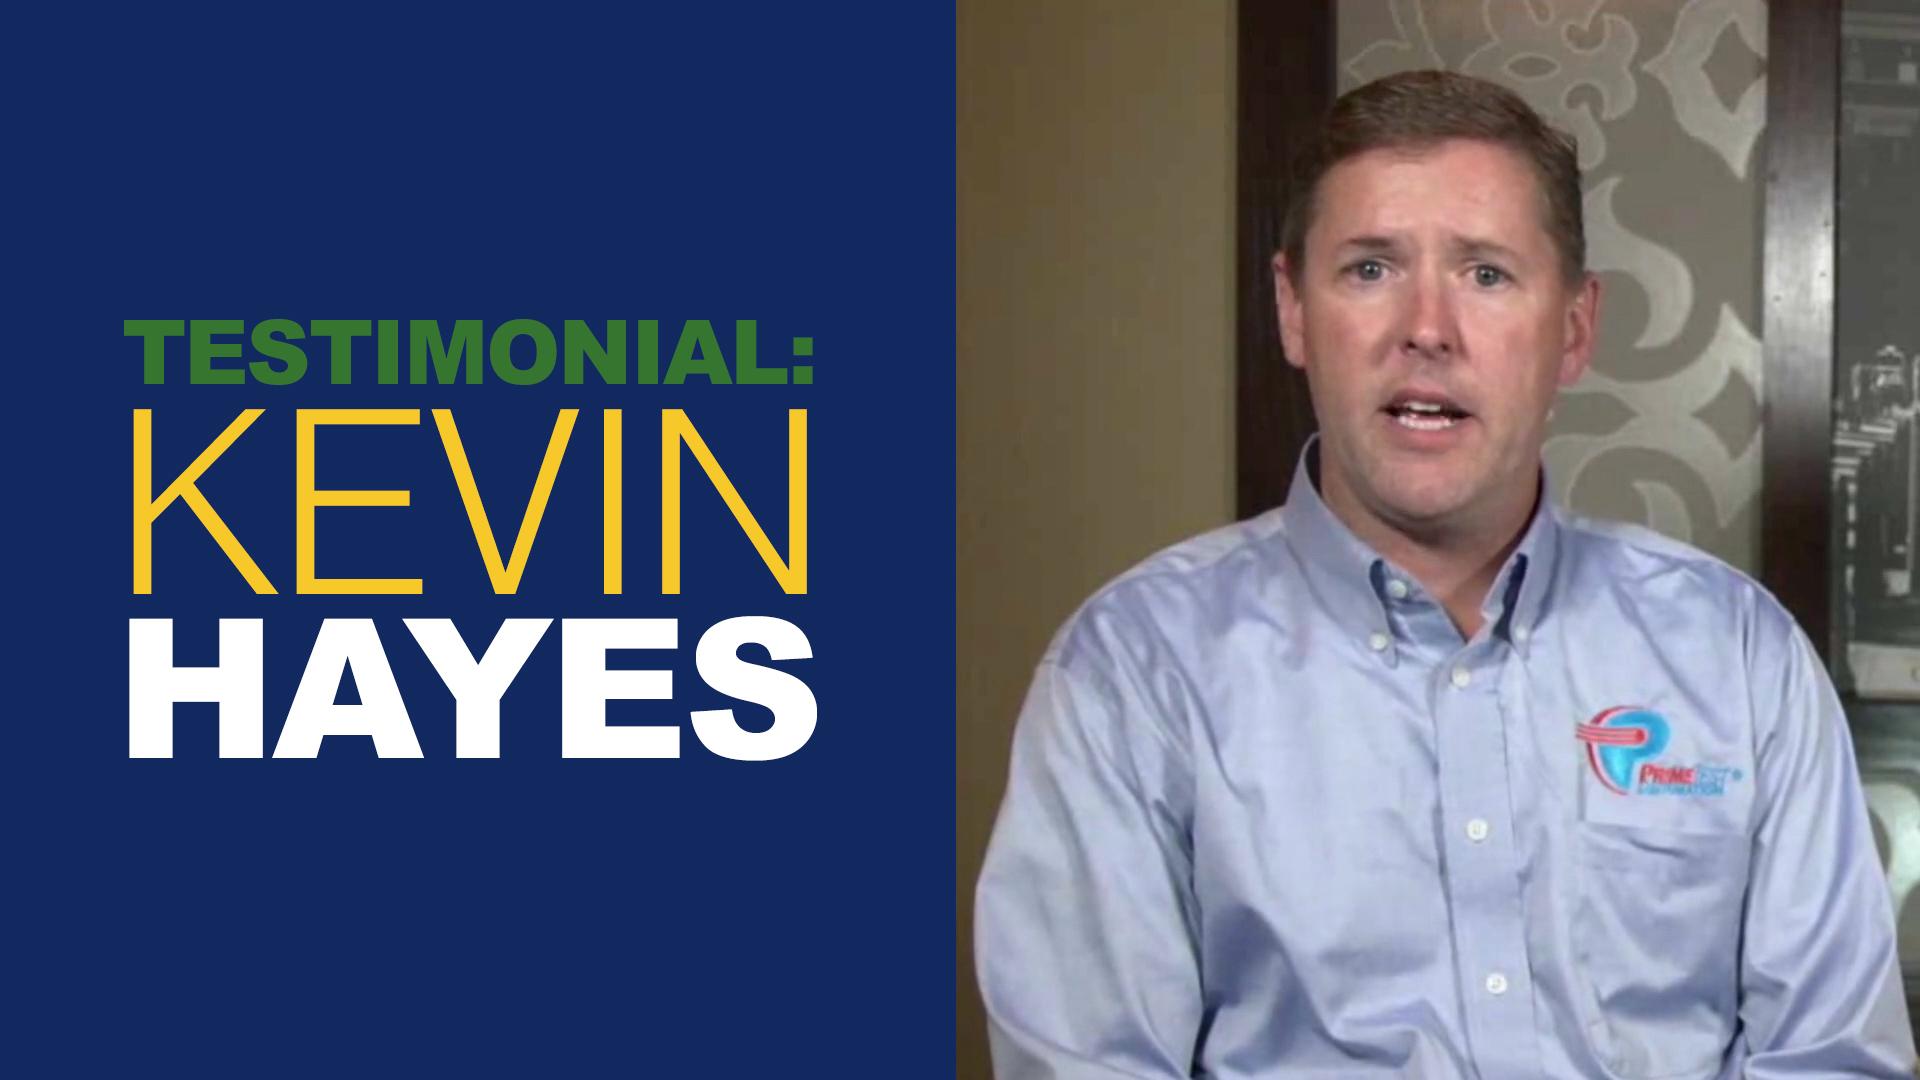 Testimonial Kevin Hayes